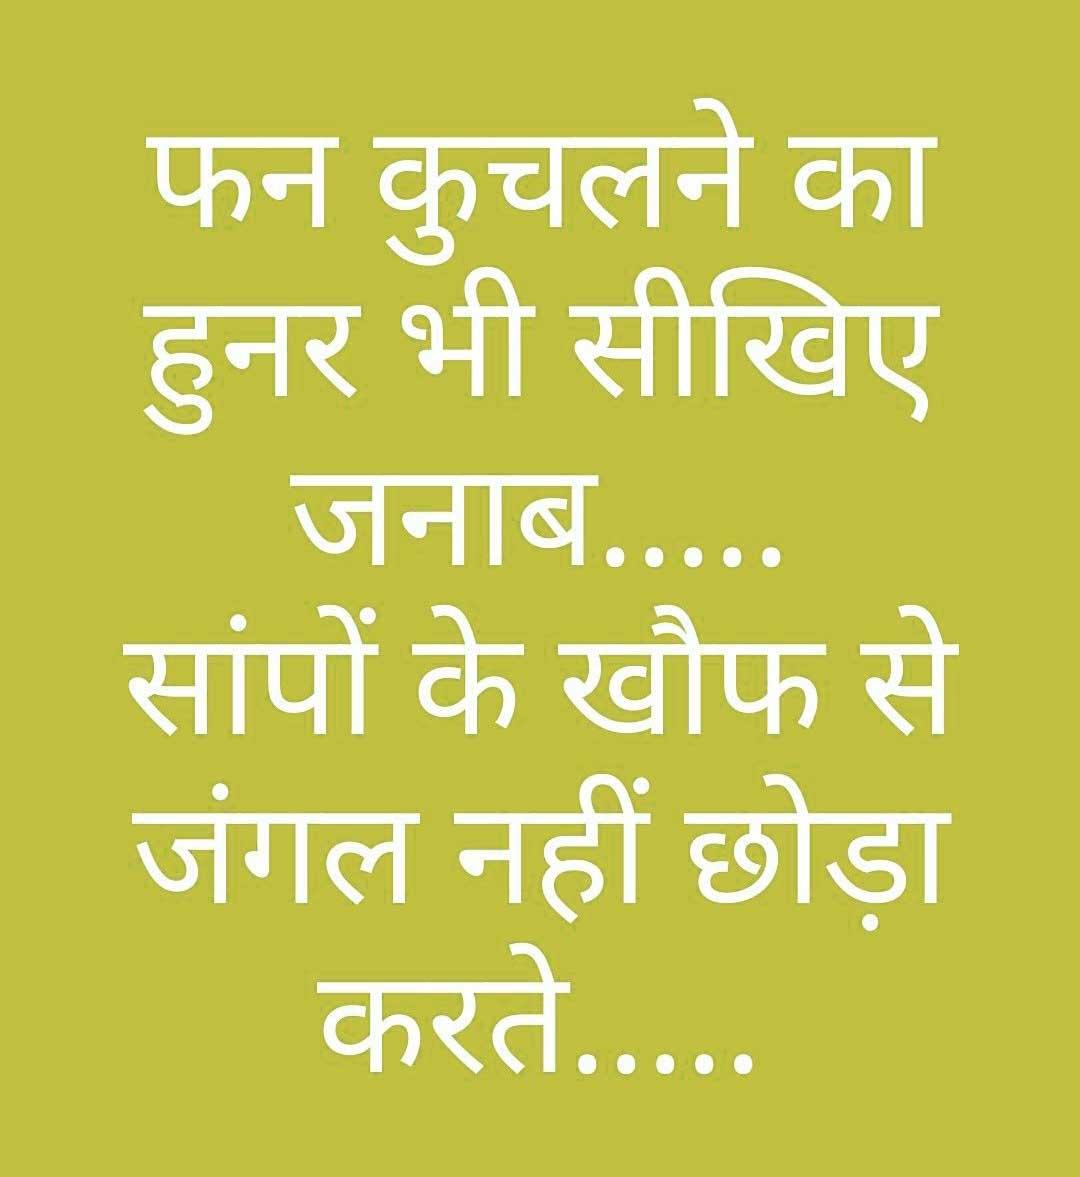 Hindi Funny Status Photo Images